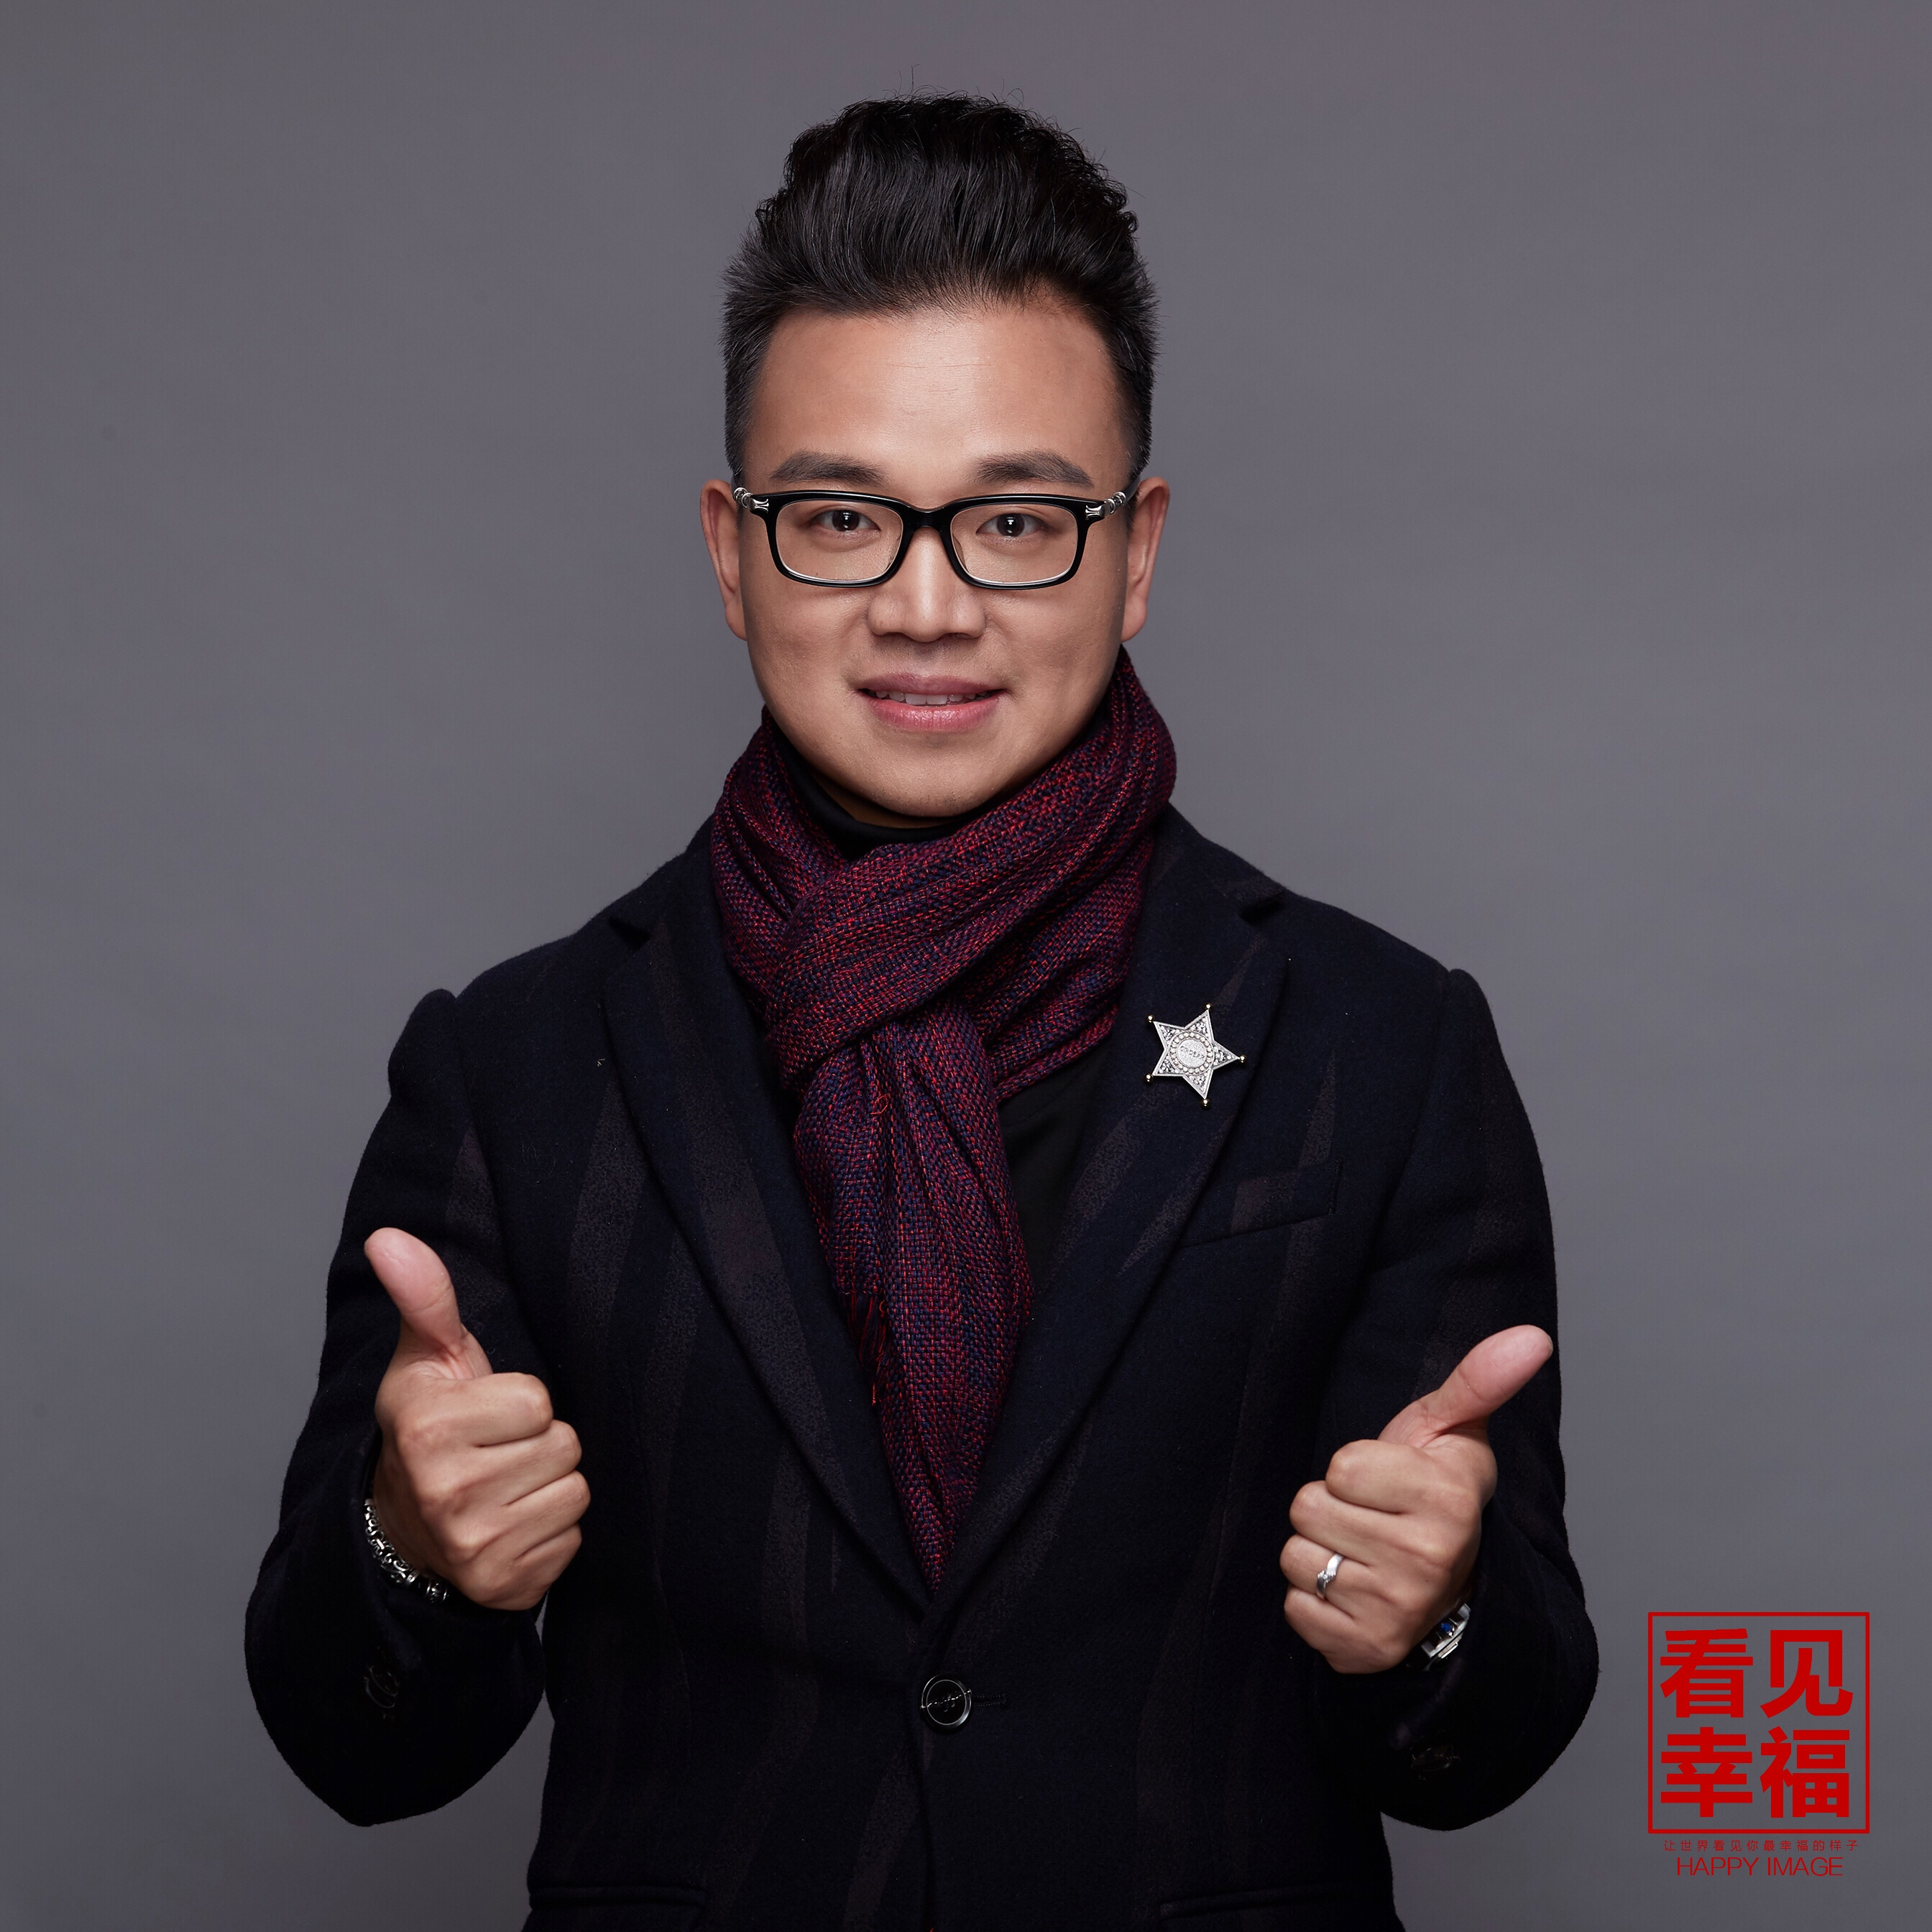 Andy.Xie